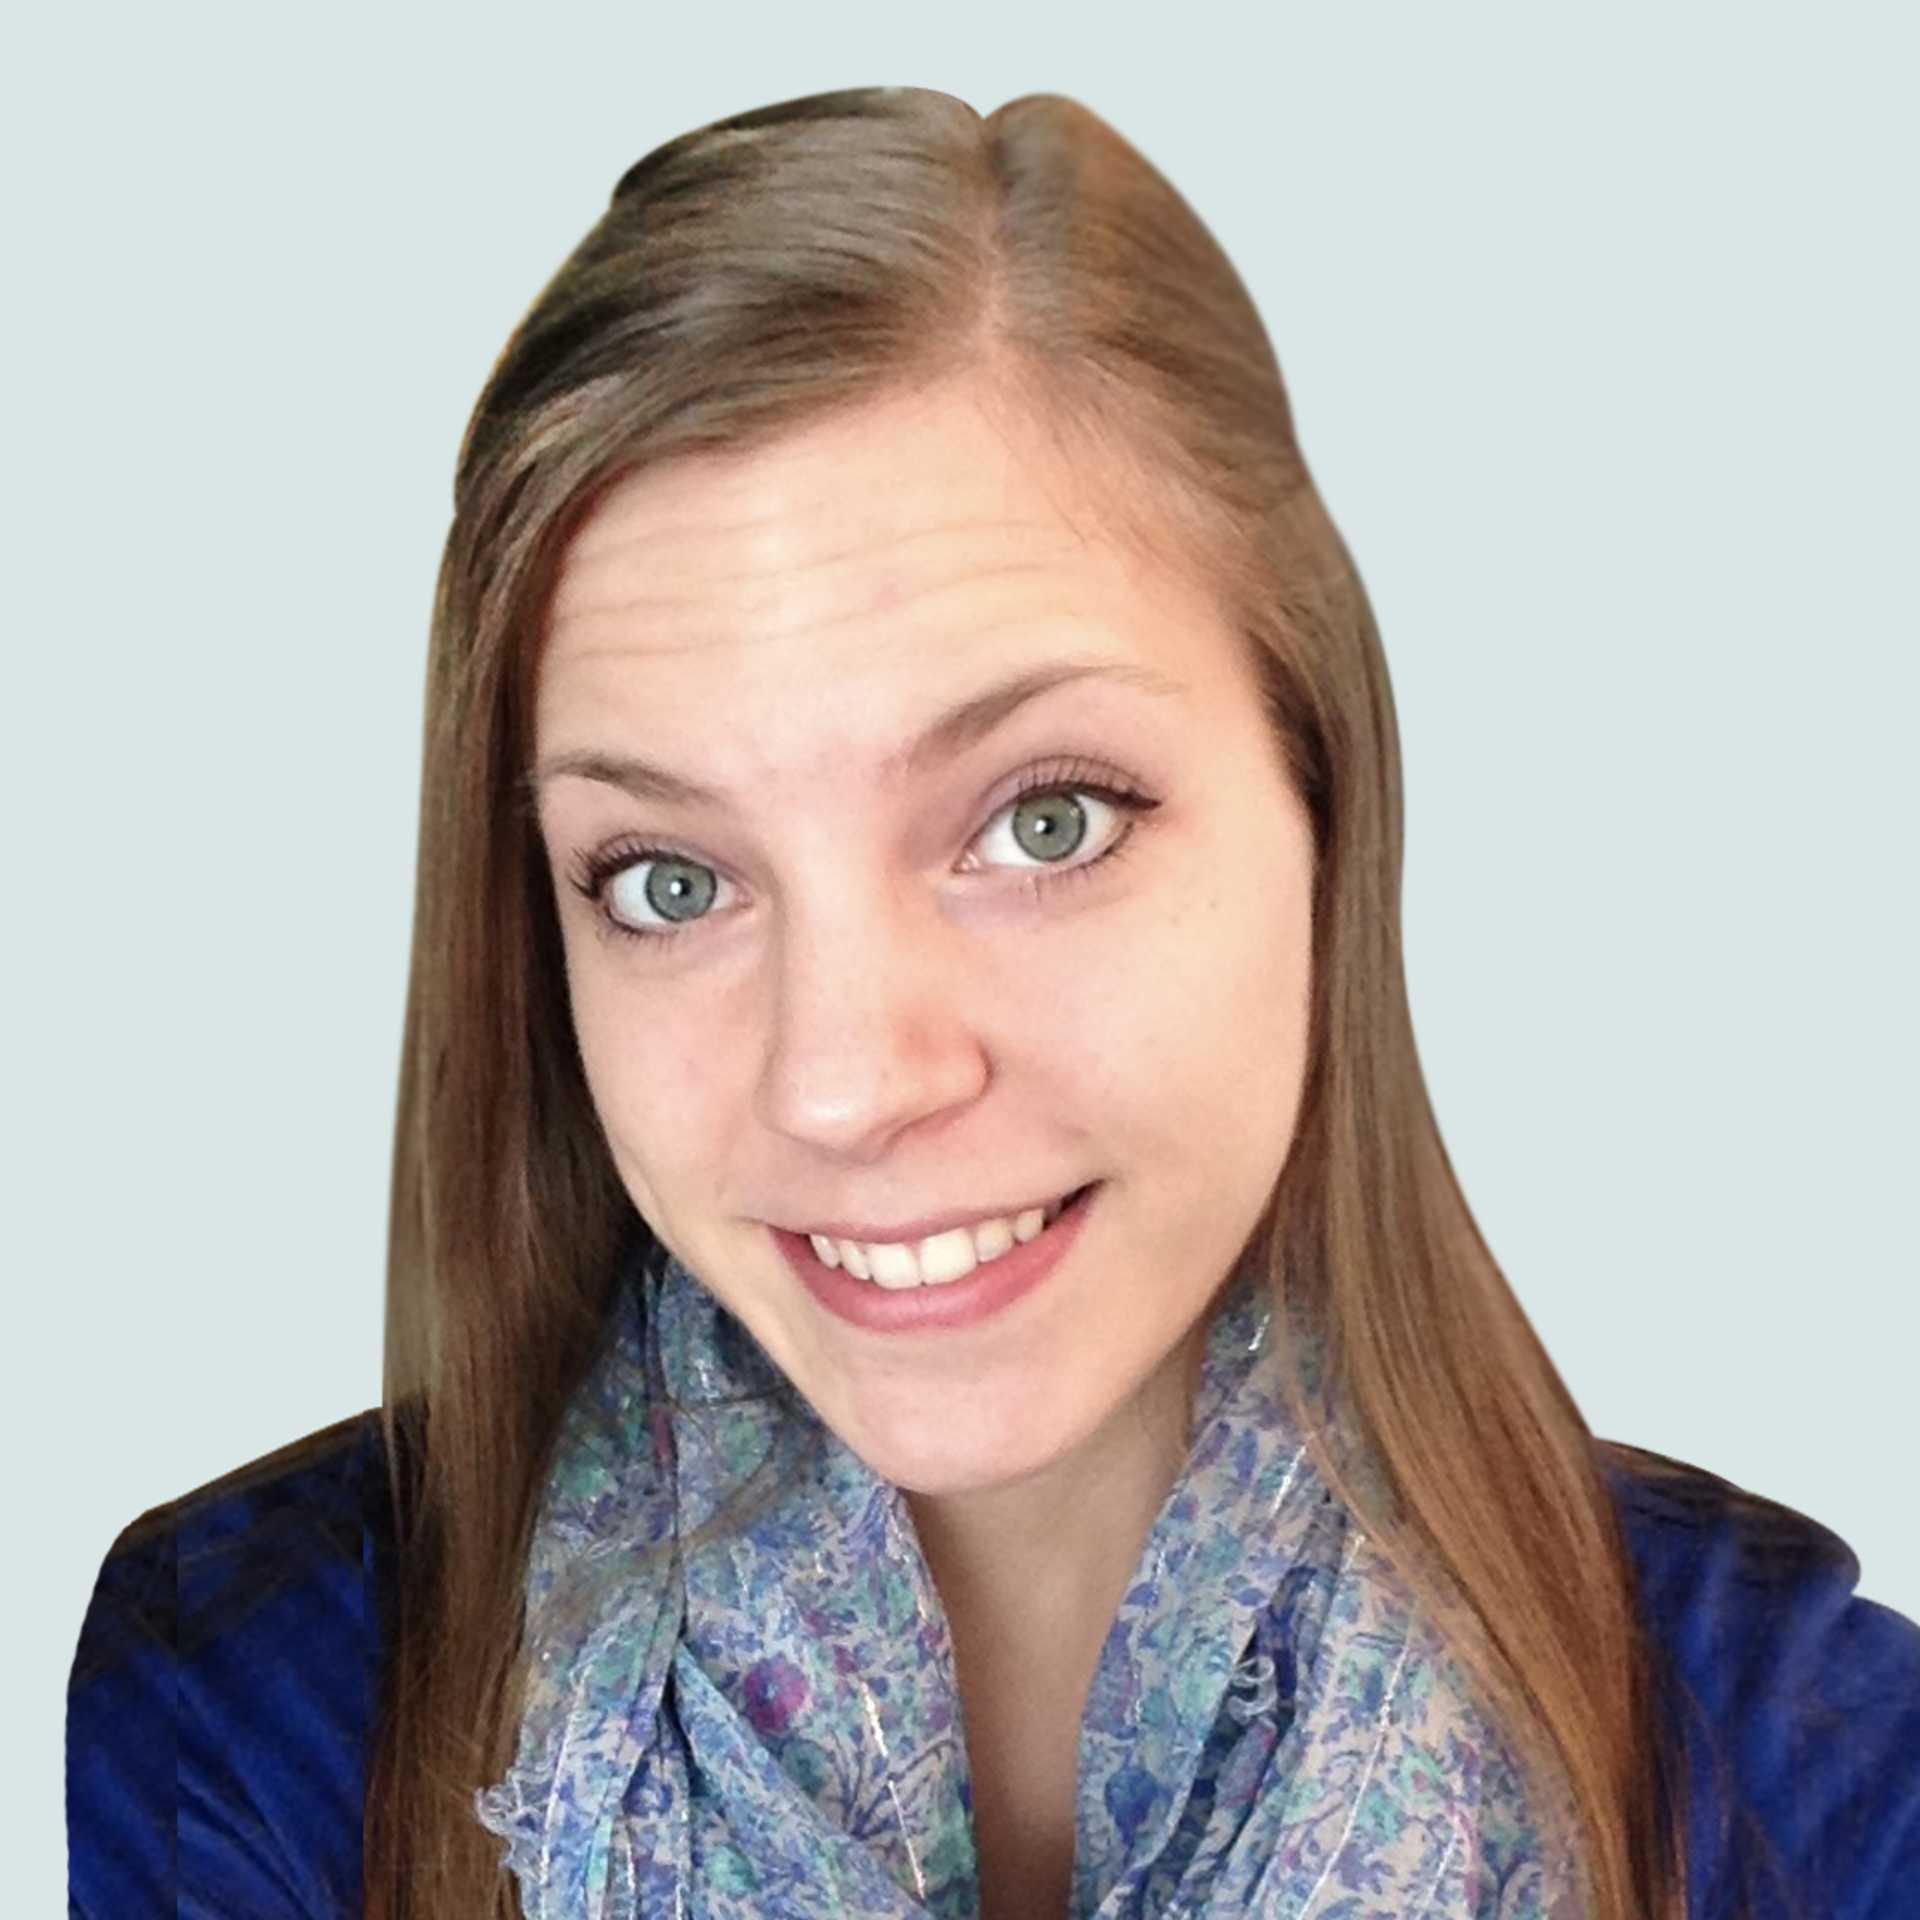 Photo of Alicia Orlopp